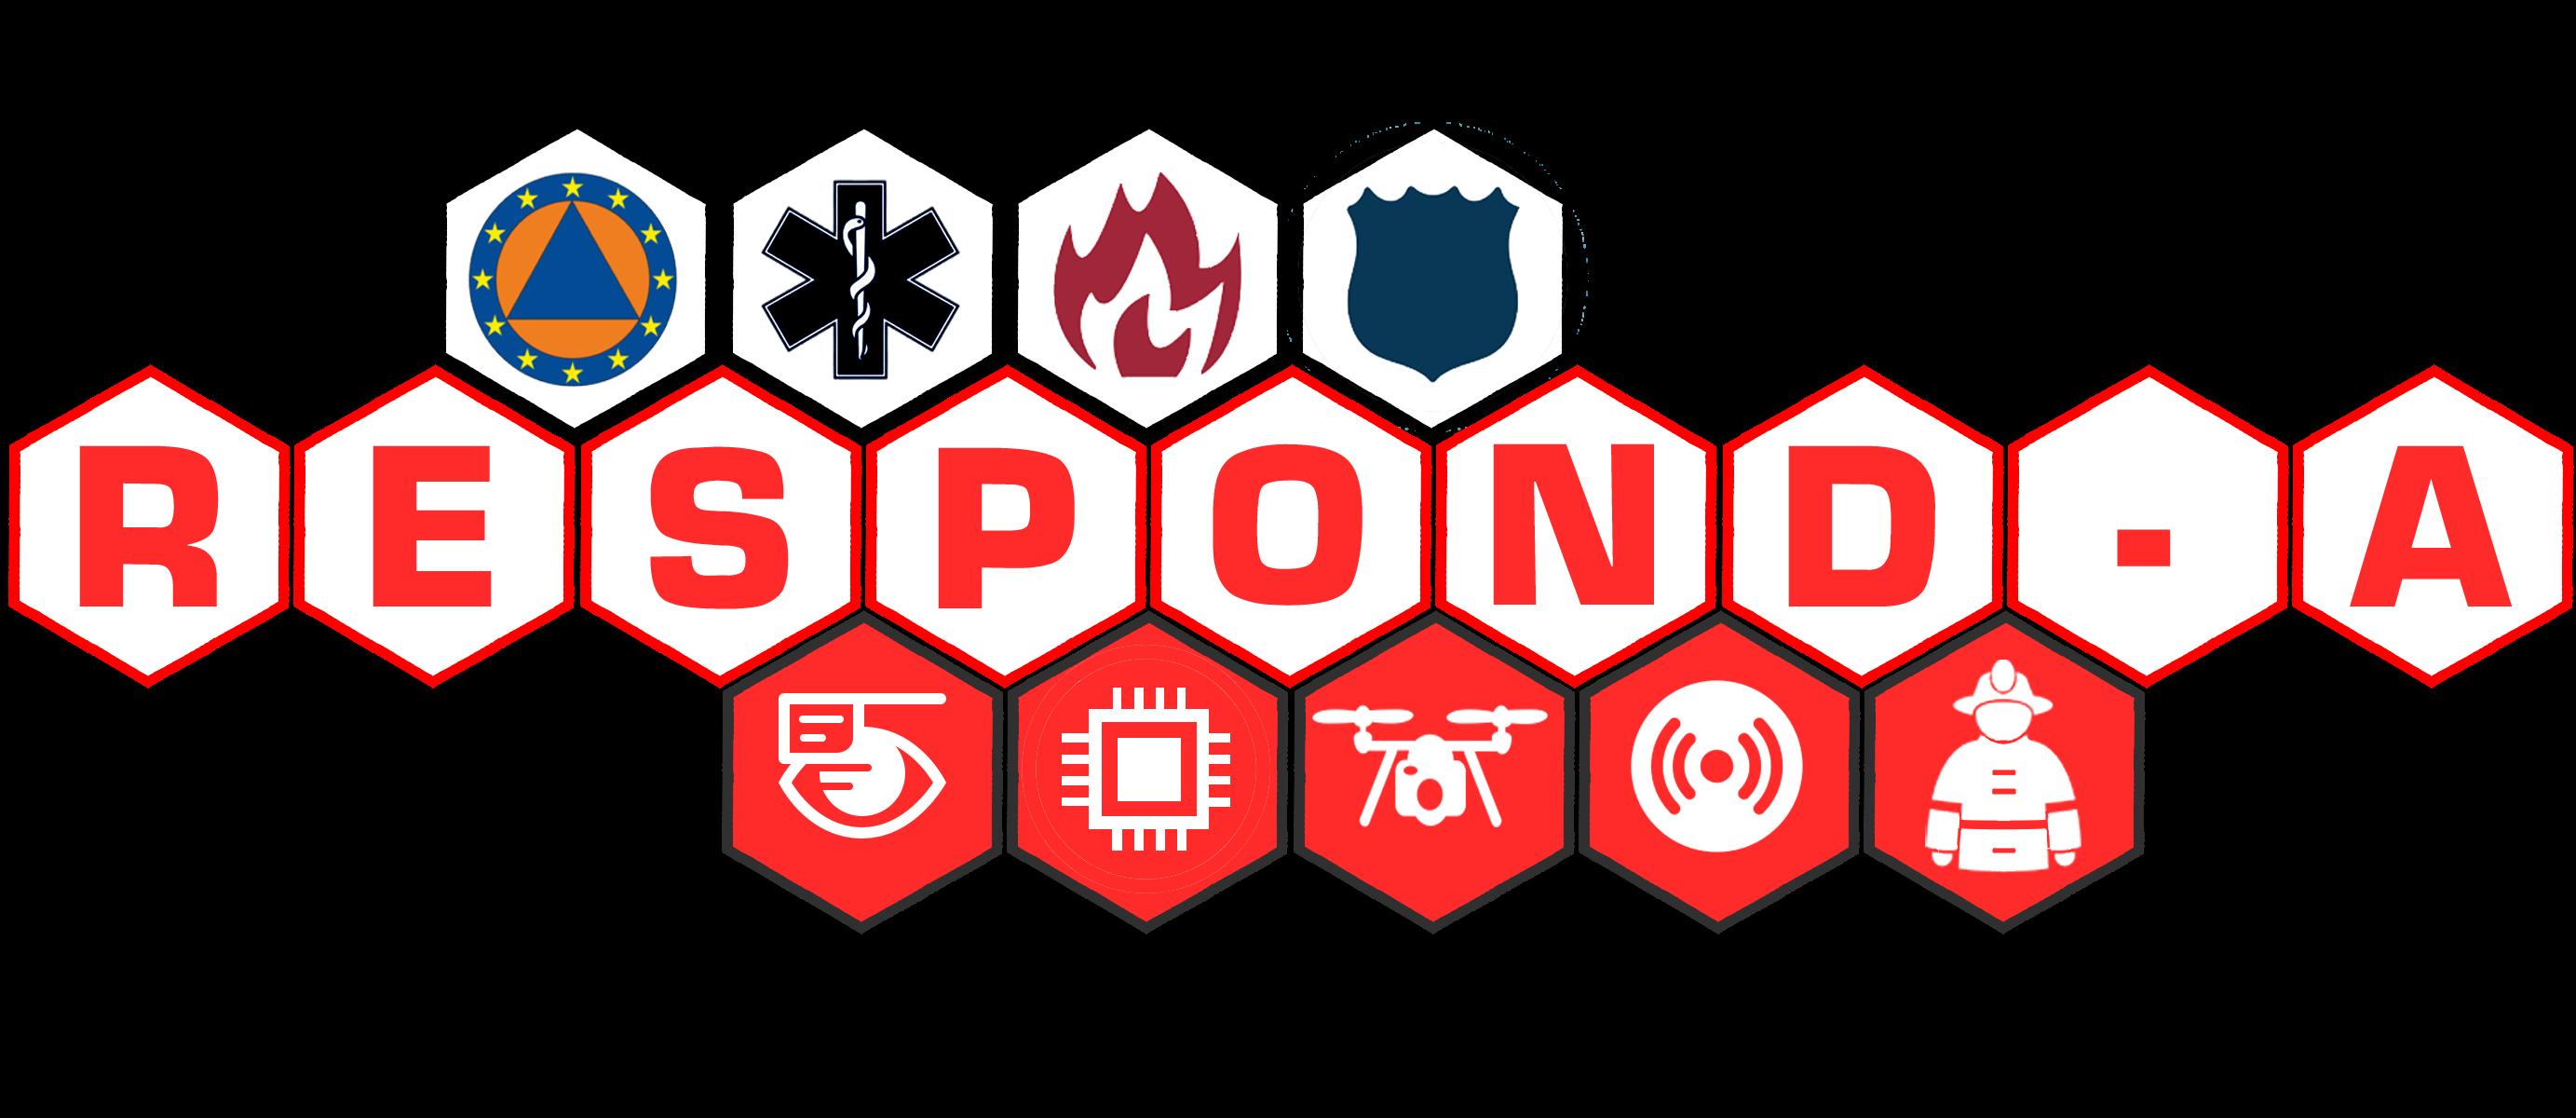 RESPOND-A